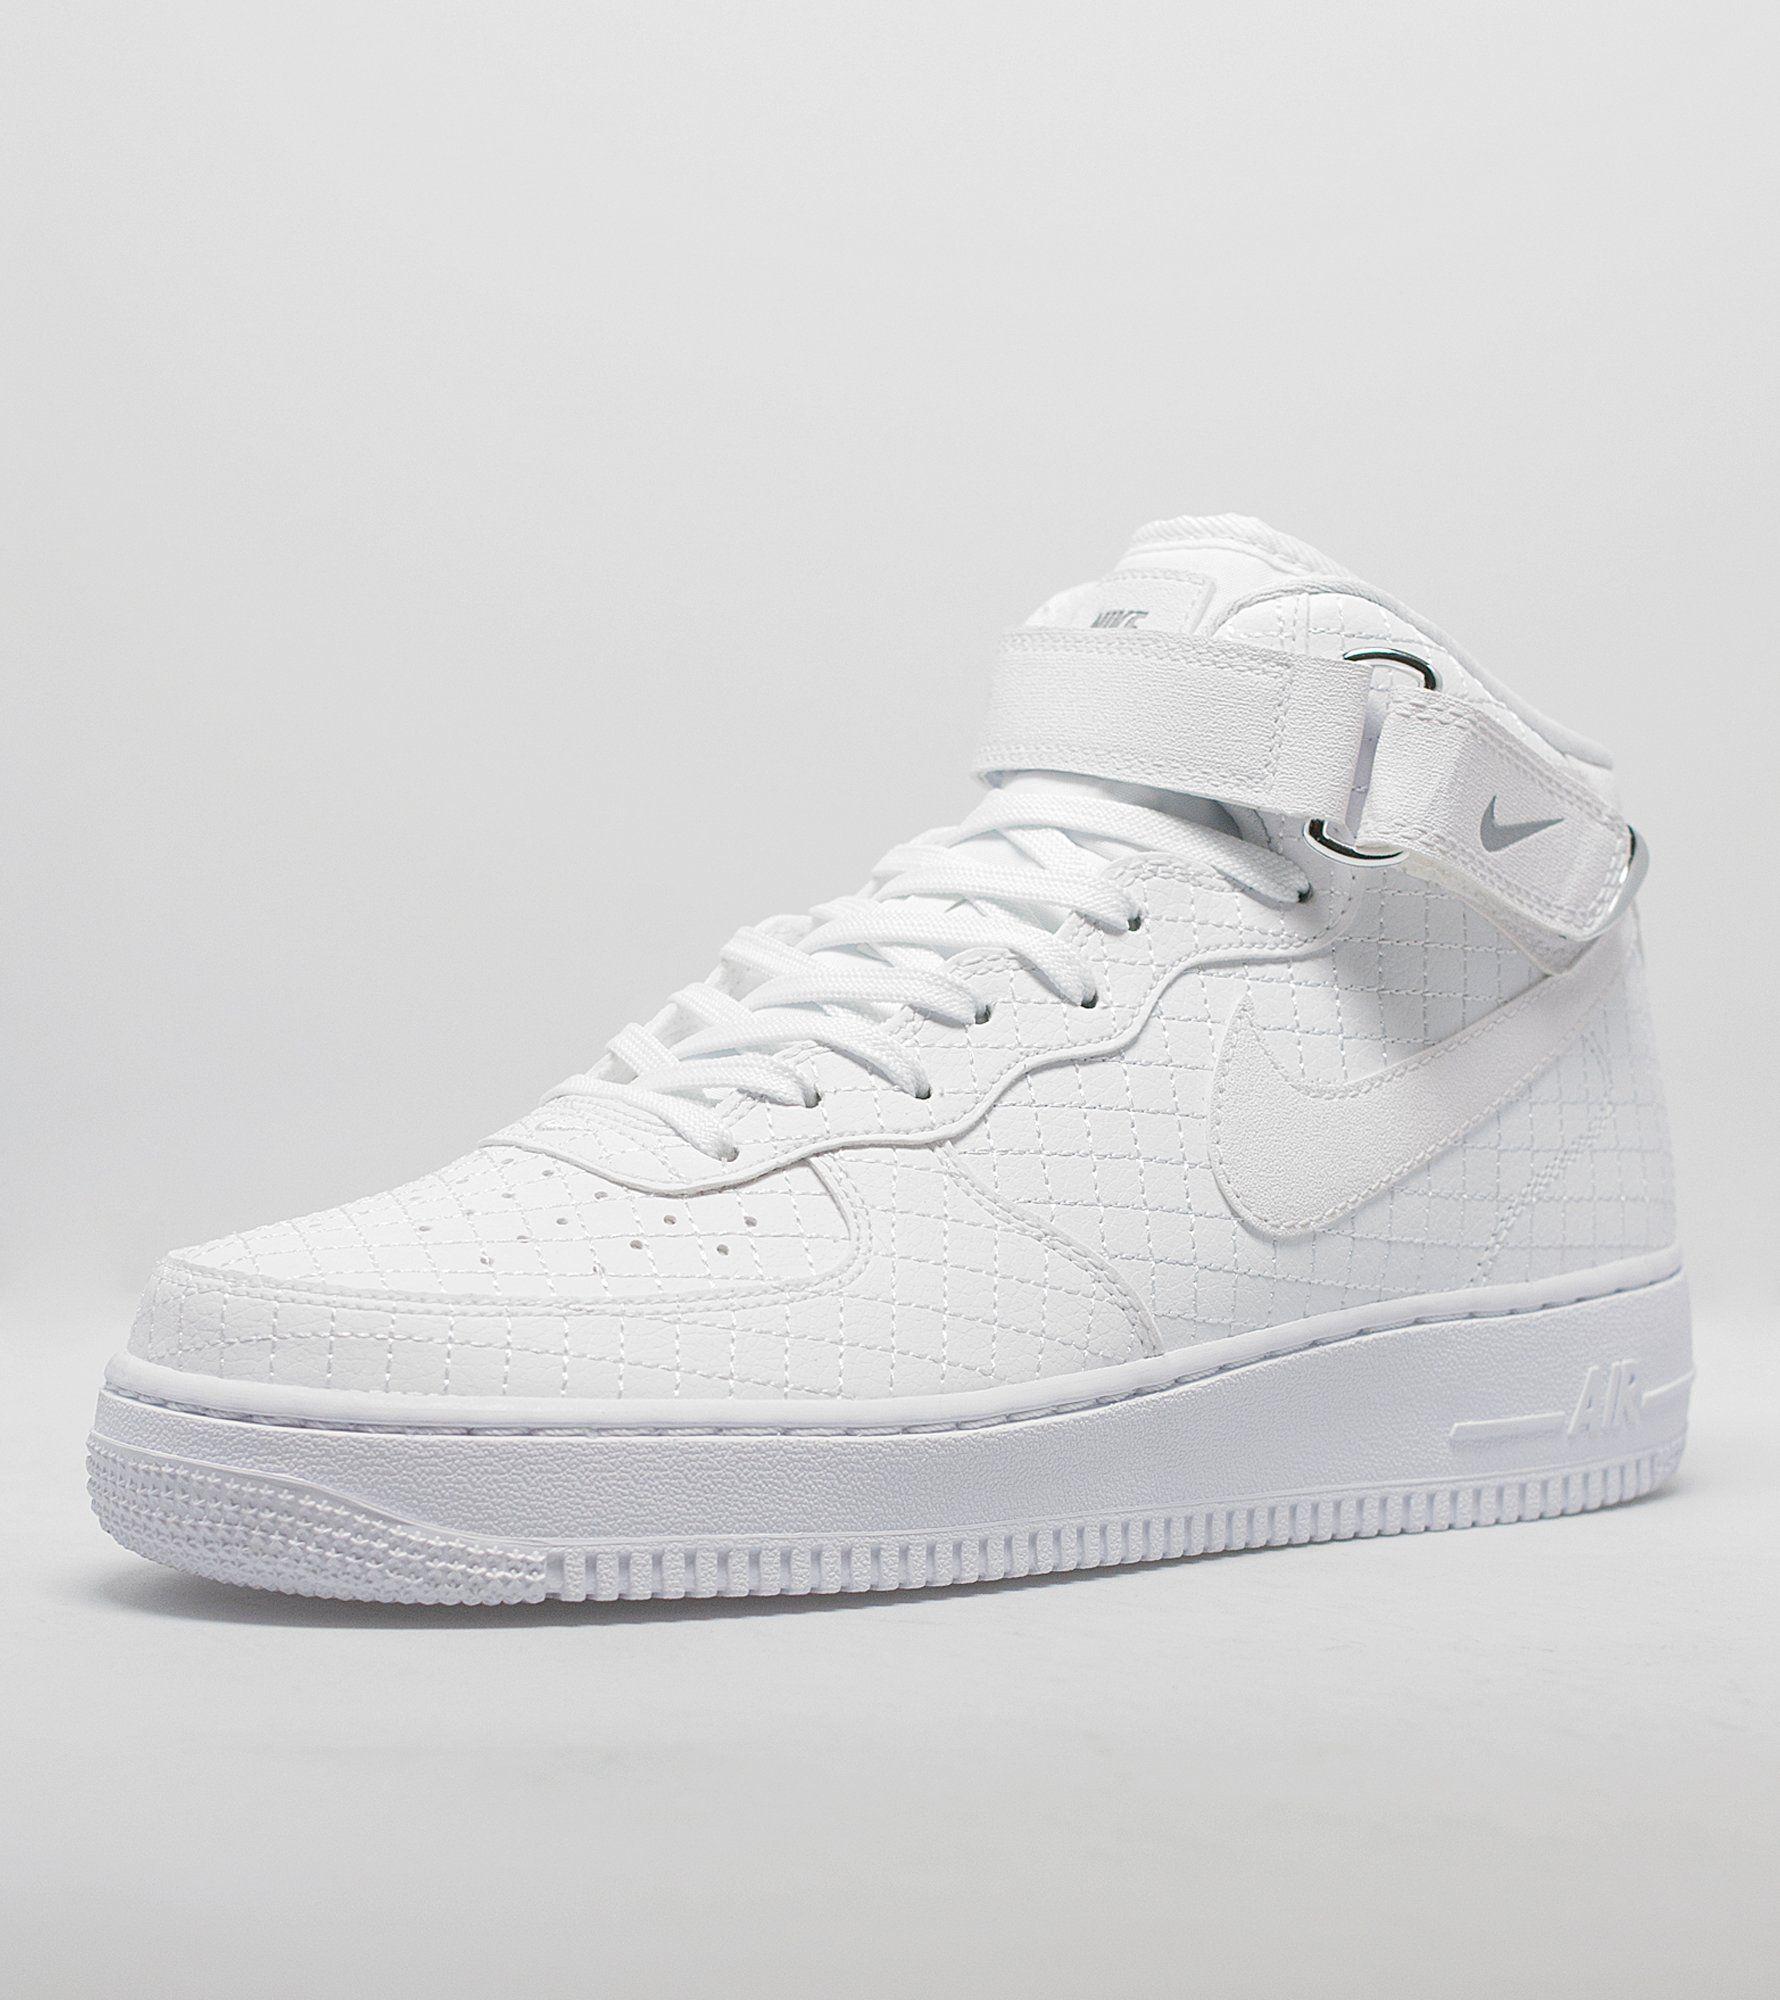 fumen Nike Air Force 1 Mid \'LV8\'  